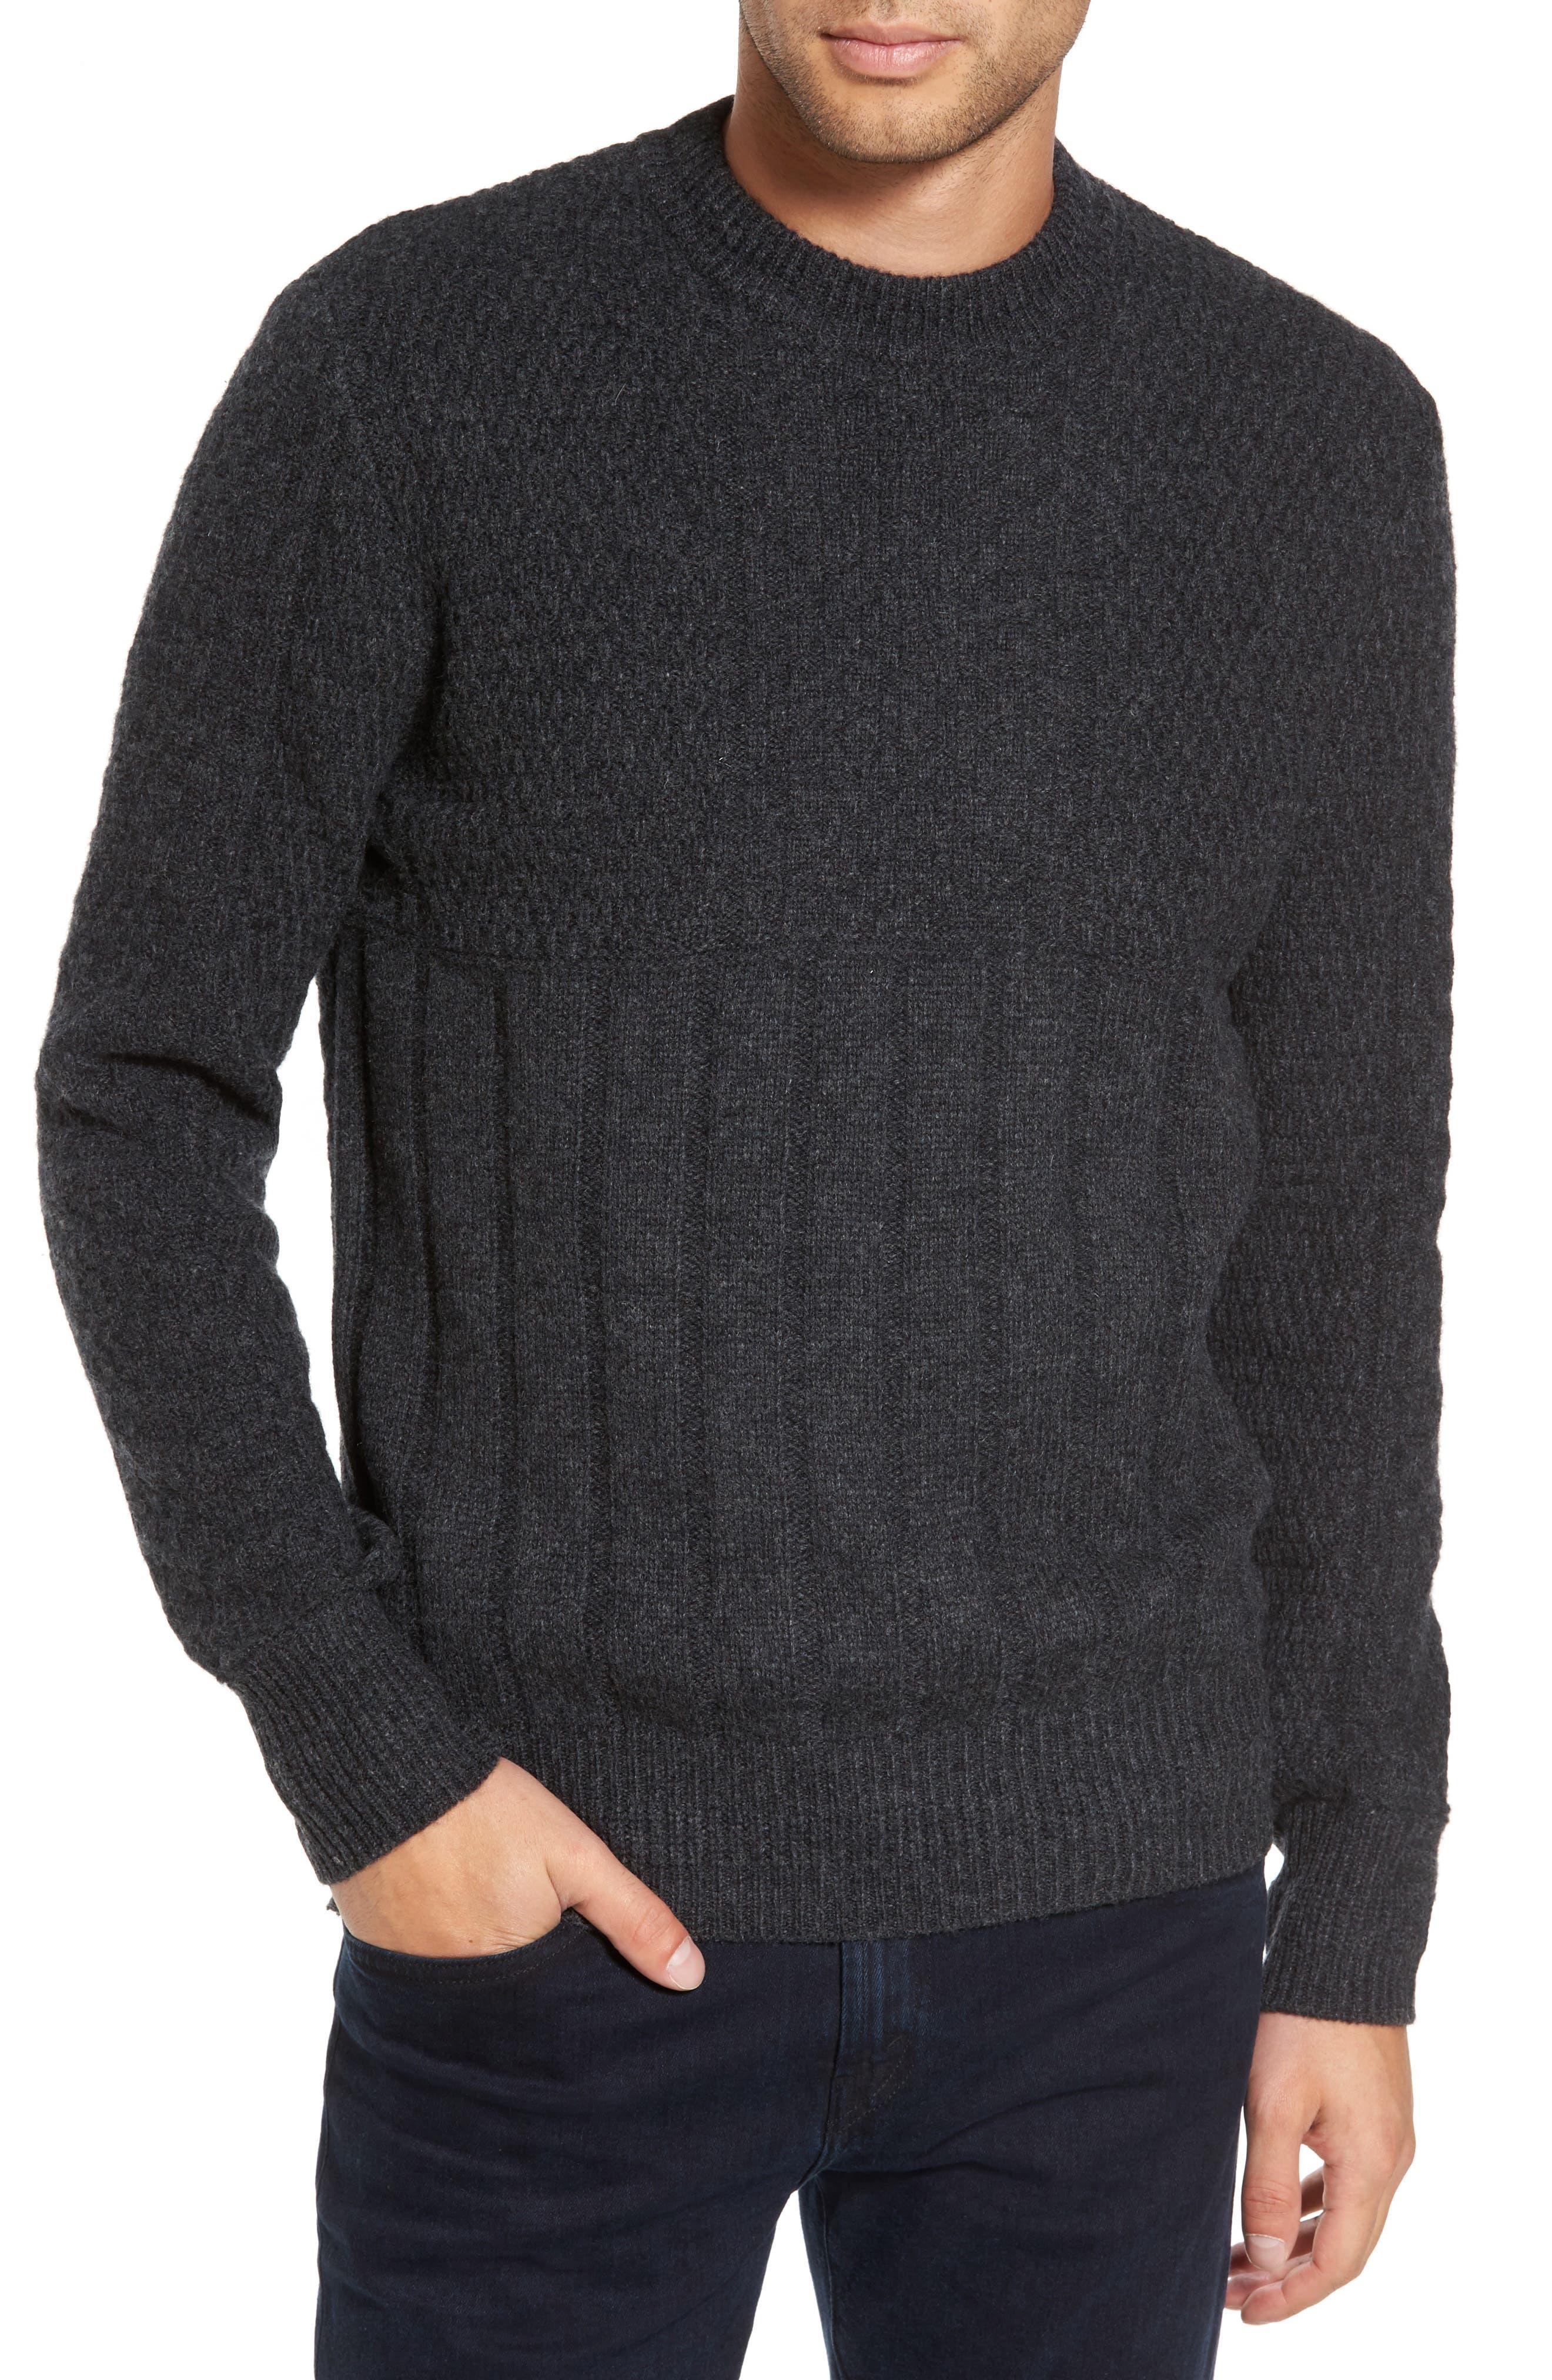 Wool Crewneck Sweater,                             Main thumbnail 1, color,                             Charcoal